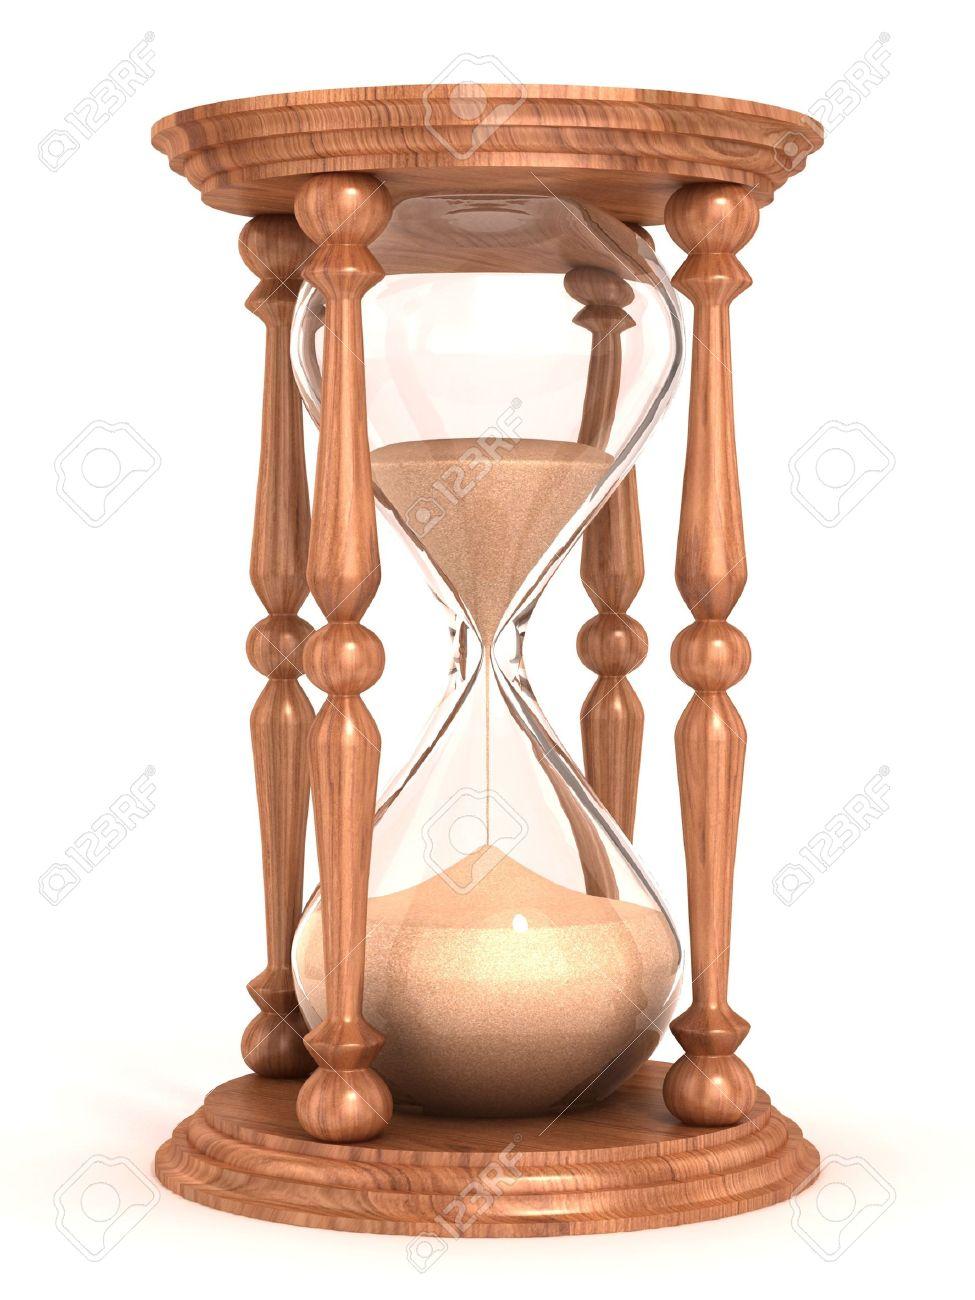 Vintage Hourglass Illustration